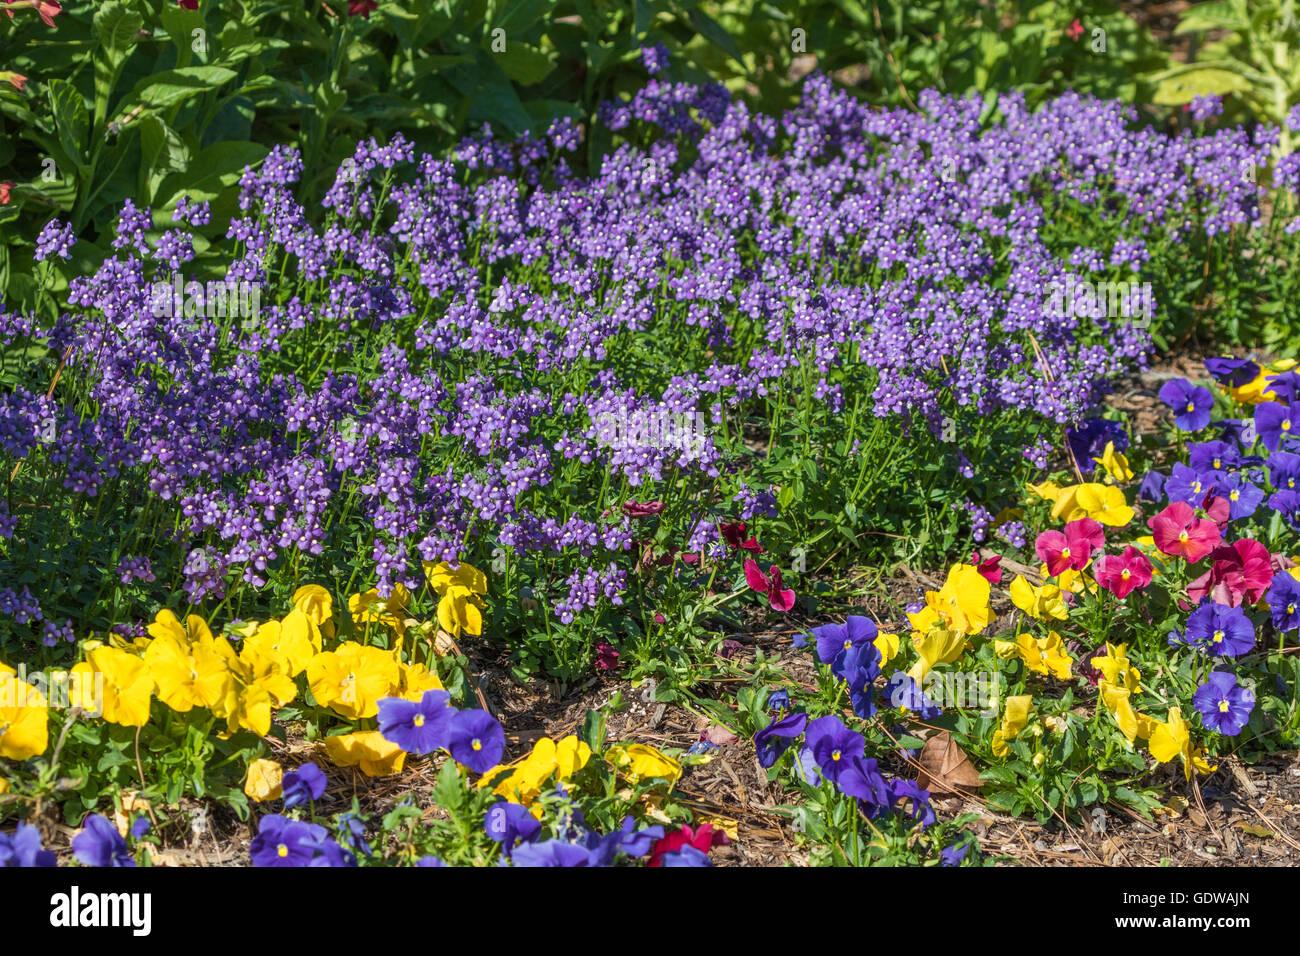 Nemesia fruticans BLUEBIRD and Viola mix at Mercer Arboretum and Botanical Gardens - Stock Image